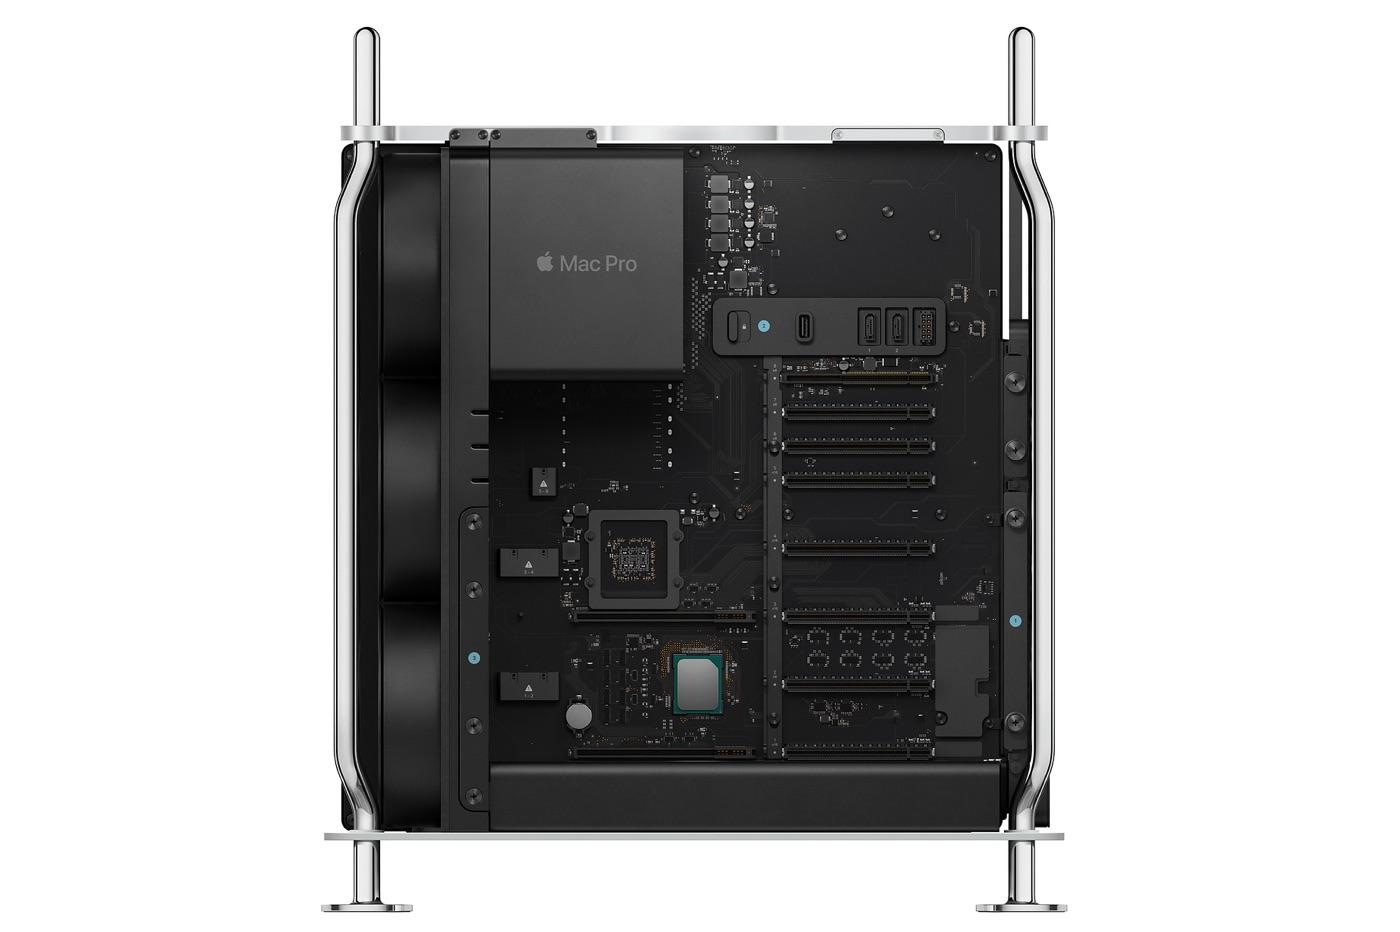 apple mac pro 2019 1 - 63 000 euros, c'est le prix du Mac Pro full option